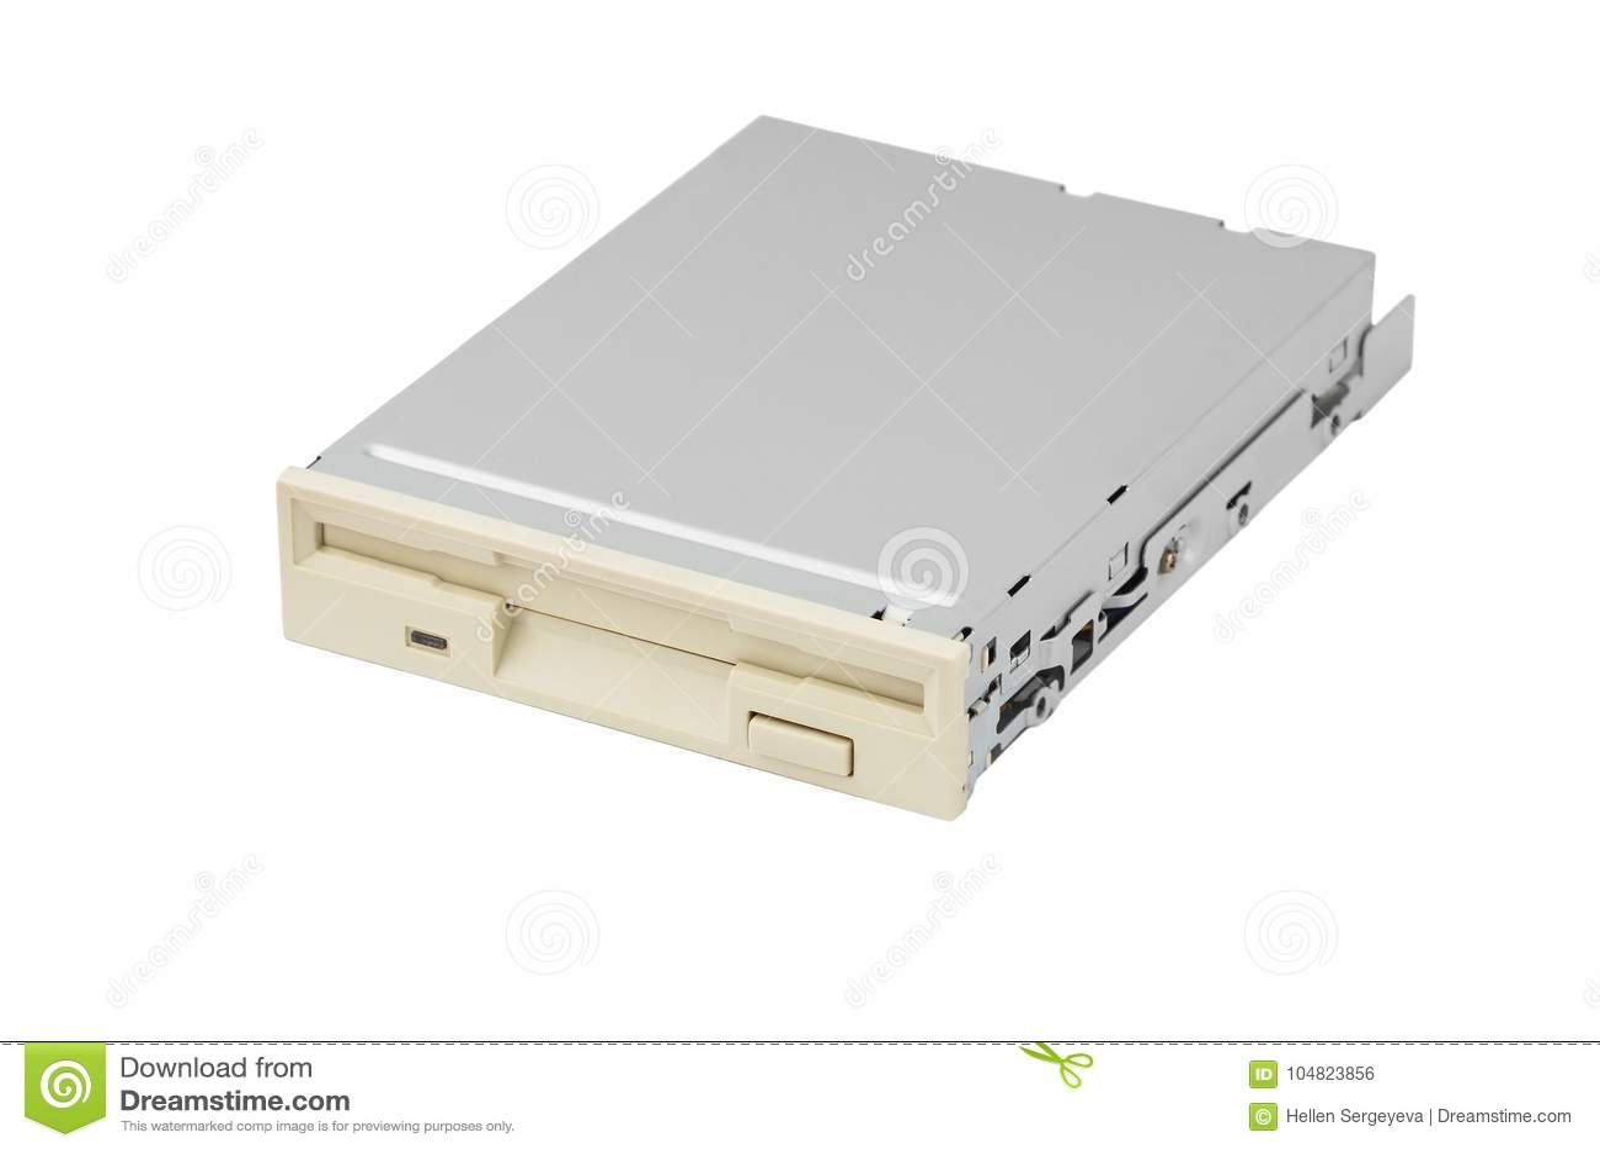 Diskettenlaufwerk